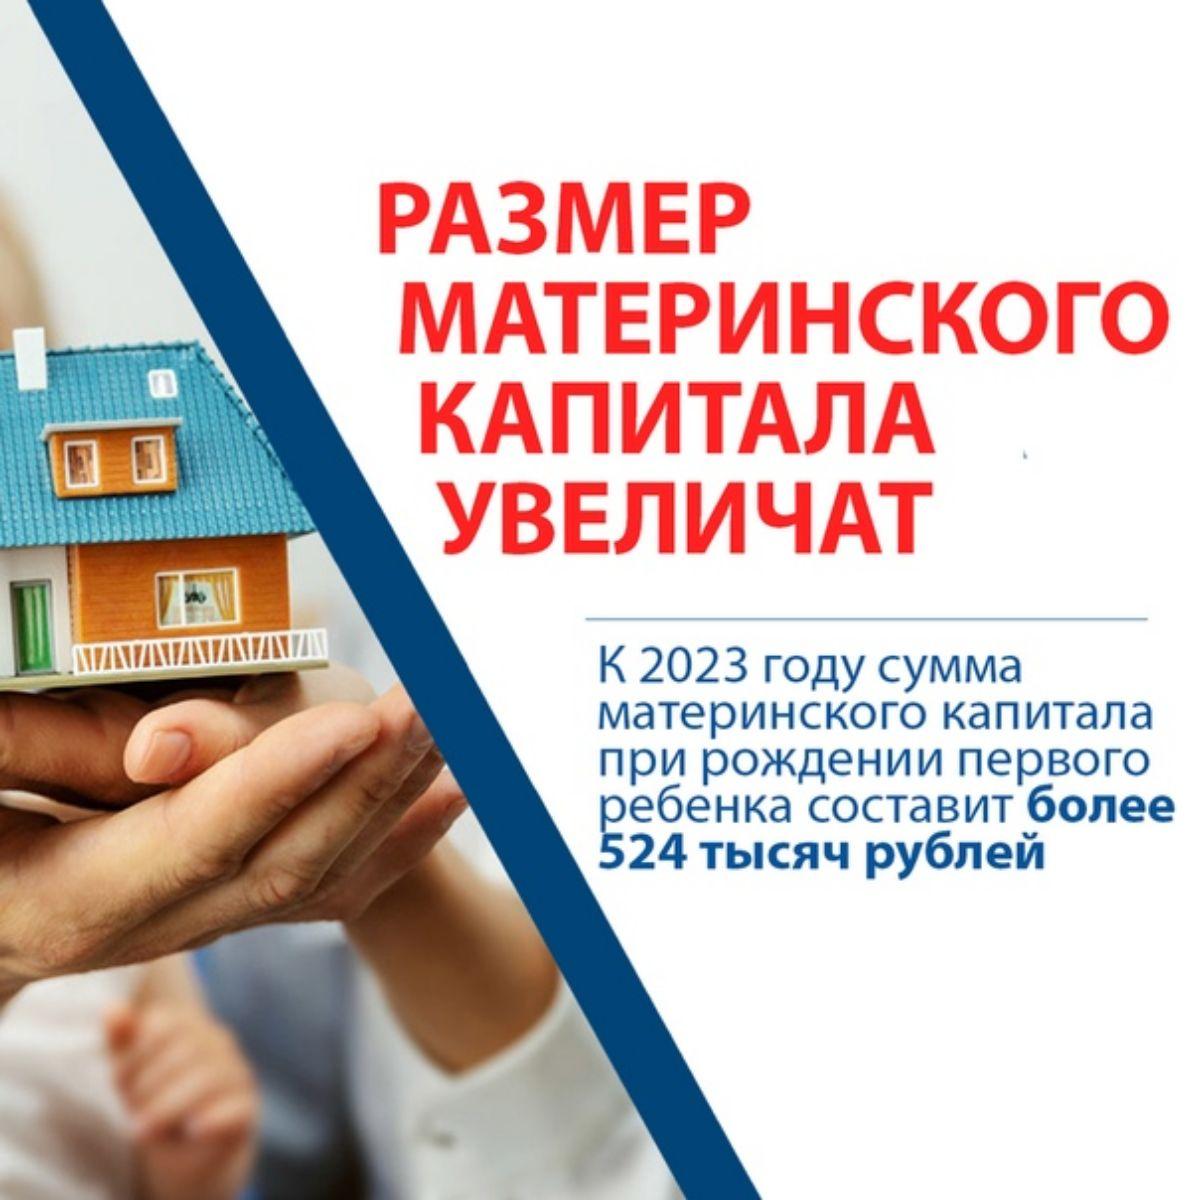 Маткапитал в 2020 году — audit-it.ru